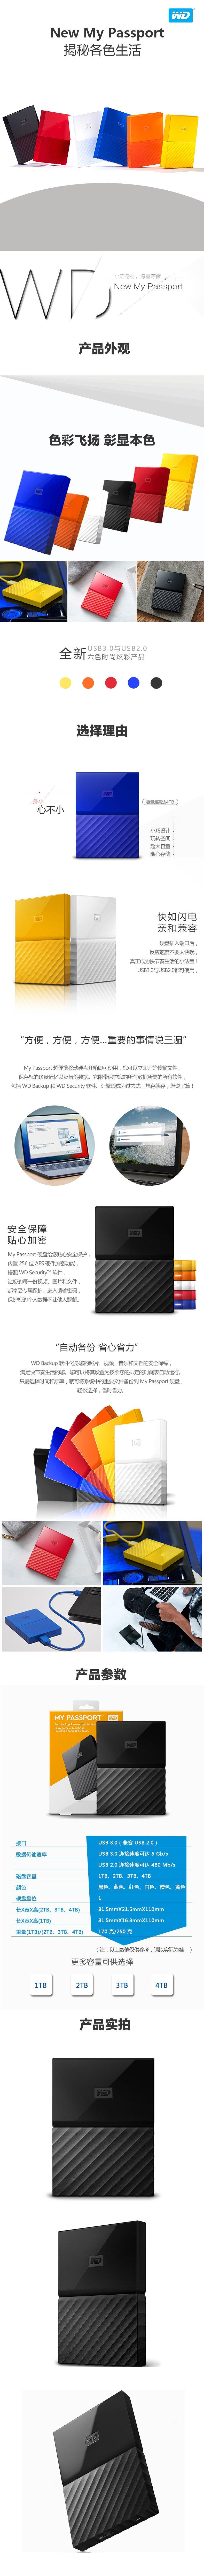 Wd 西部数据 My Passport 2.5英寸 移动硬盘 配有密码保护功能和自动备份软件